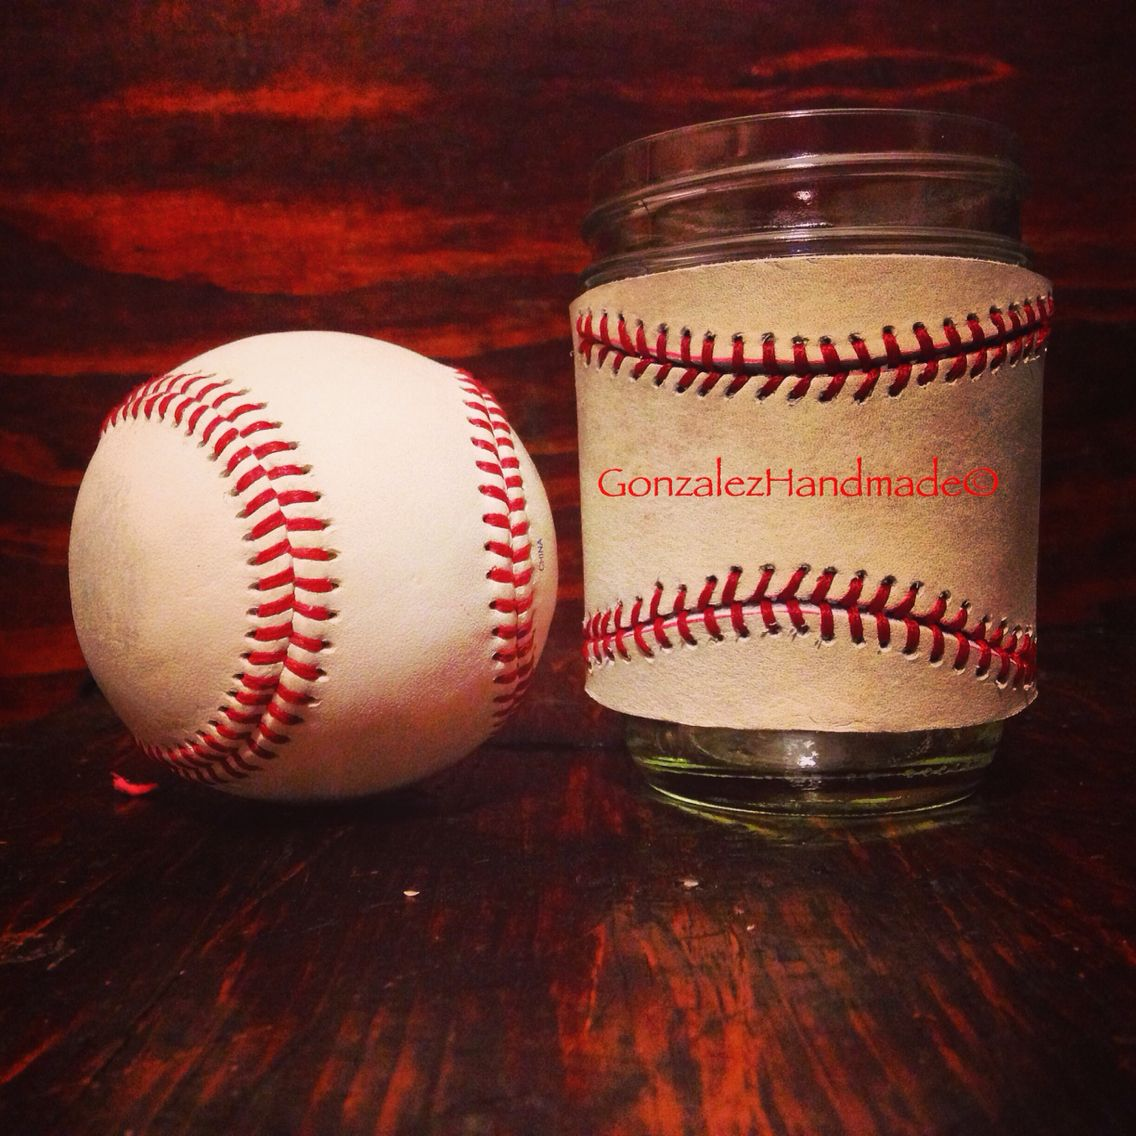 Hand made hand stitched mason jar sleeve made in a baseball theme.